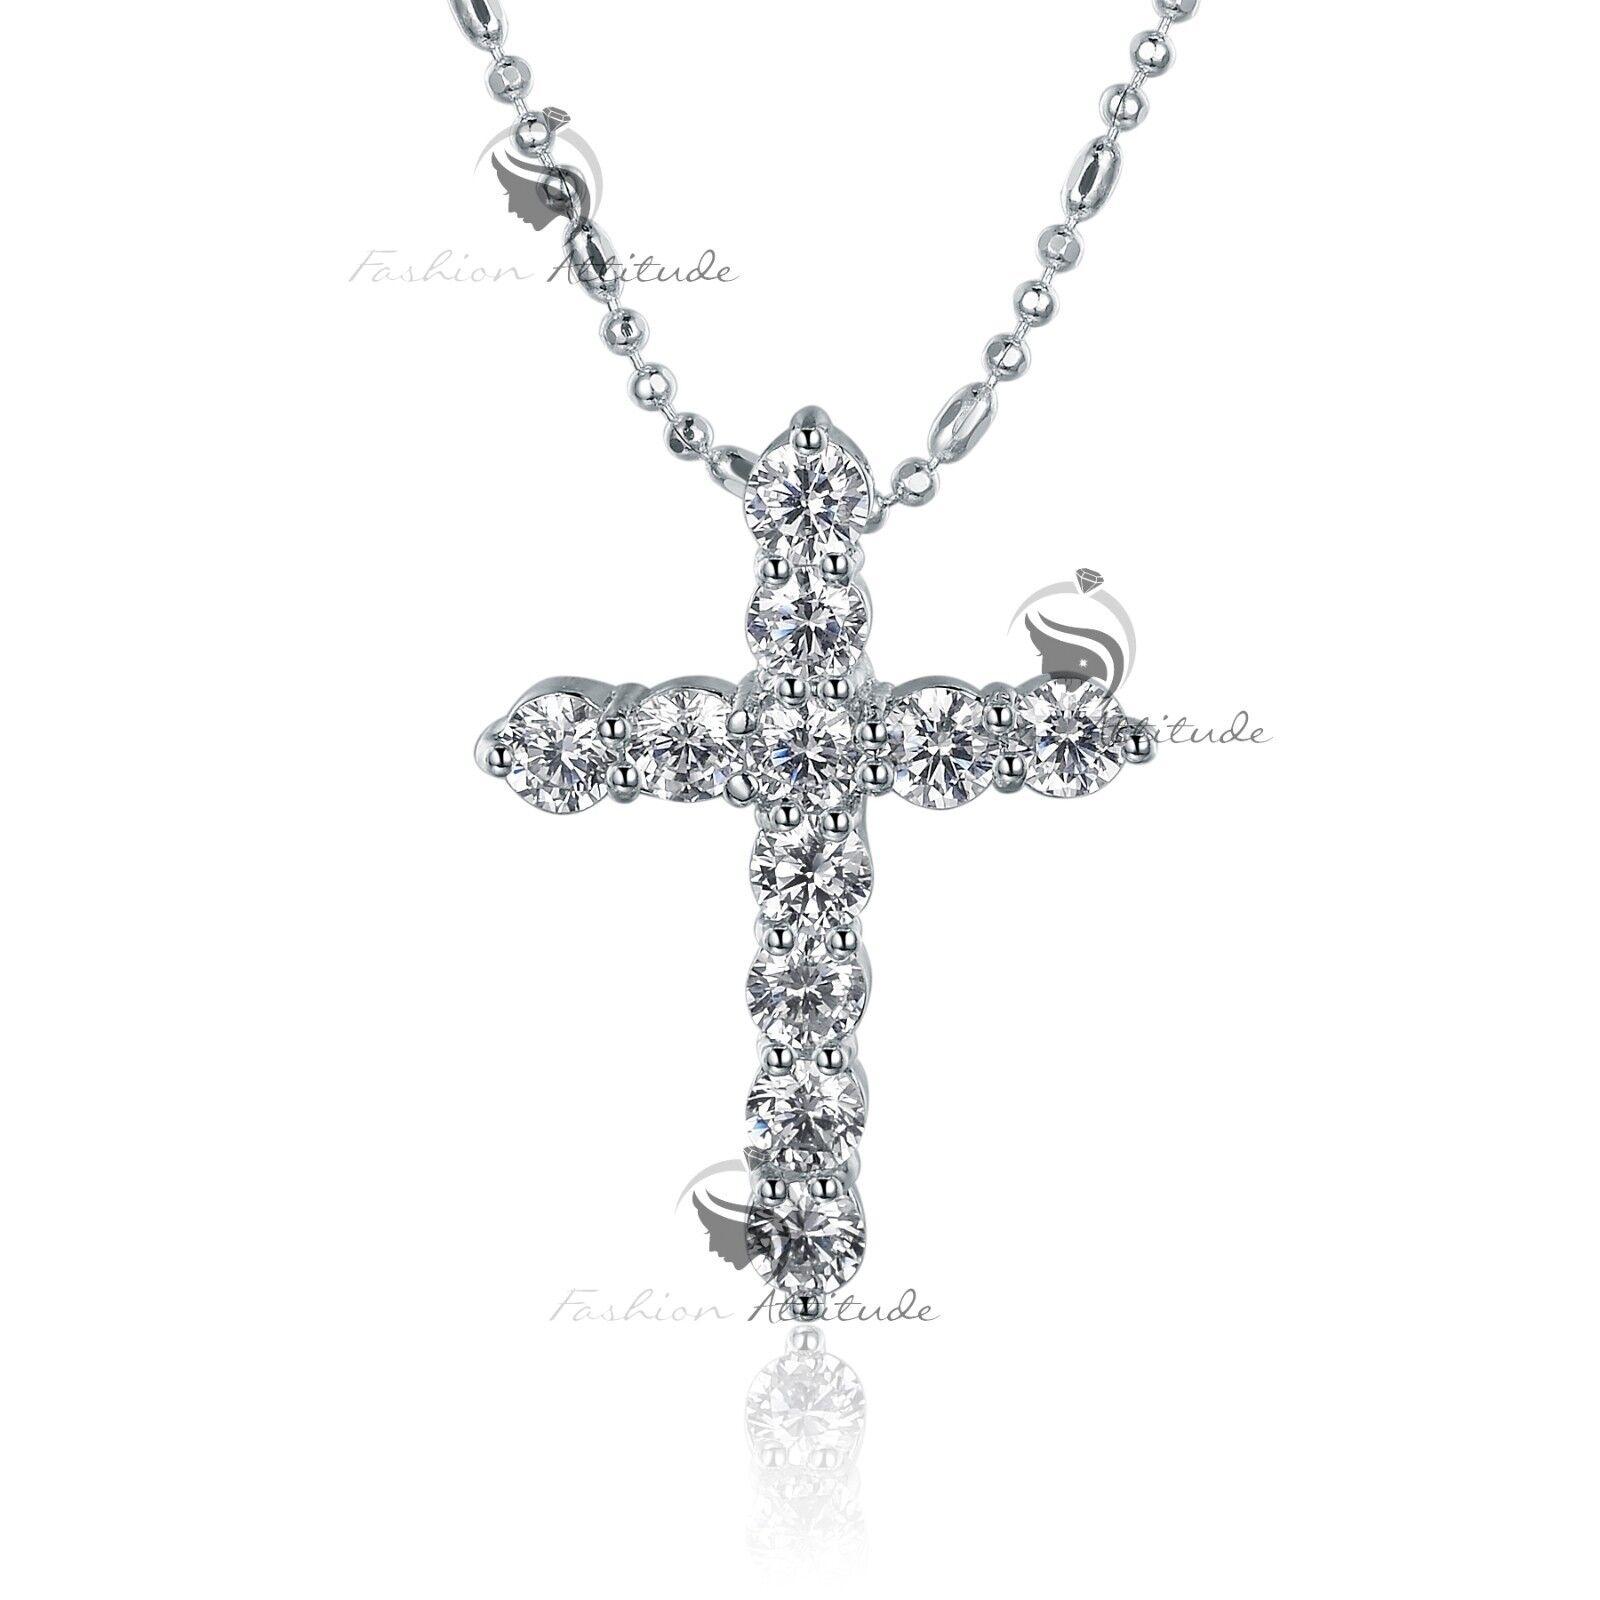 18k white gold gf made with swarovski crystal cross pendant necklace 18k white gold gf made with swarovski crystal cross pendant necklace aloadofball Choice Image